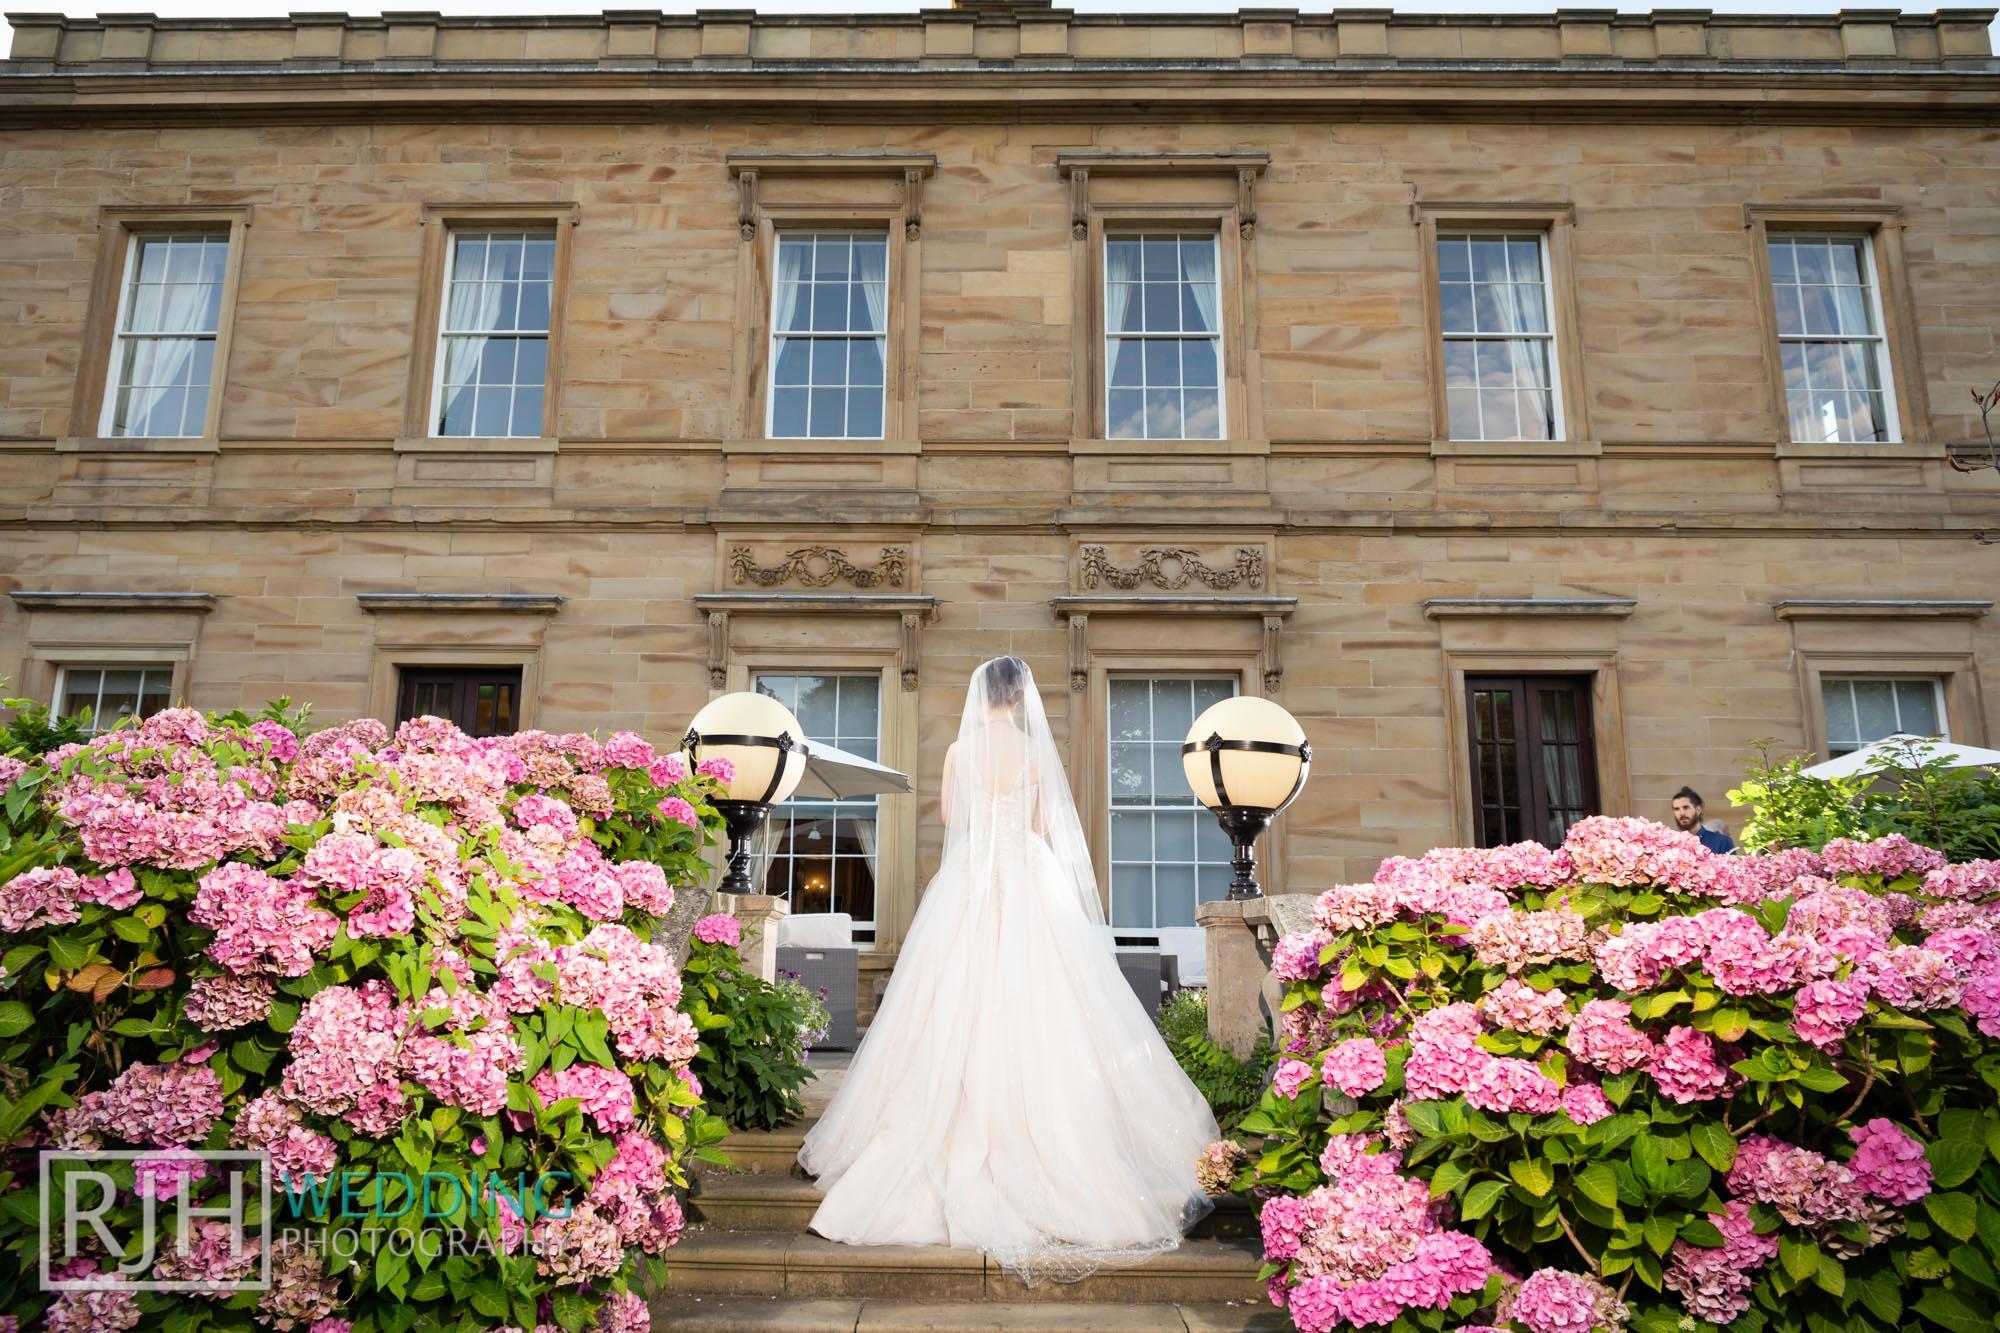 Oulton Hall Wedding Photography_Goodwill-Hall_048_IMG_6854.jpg